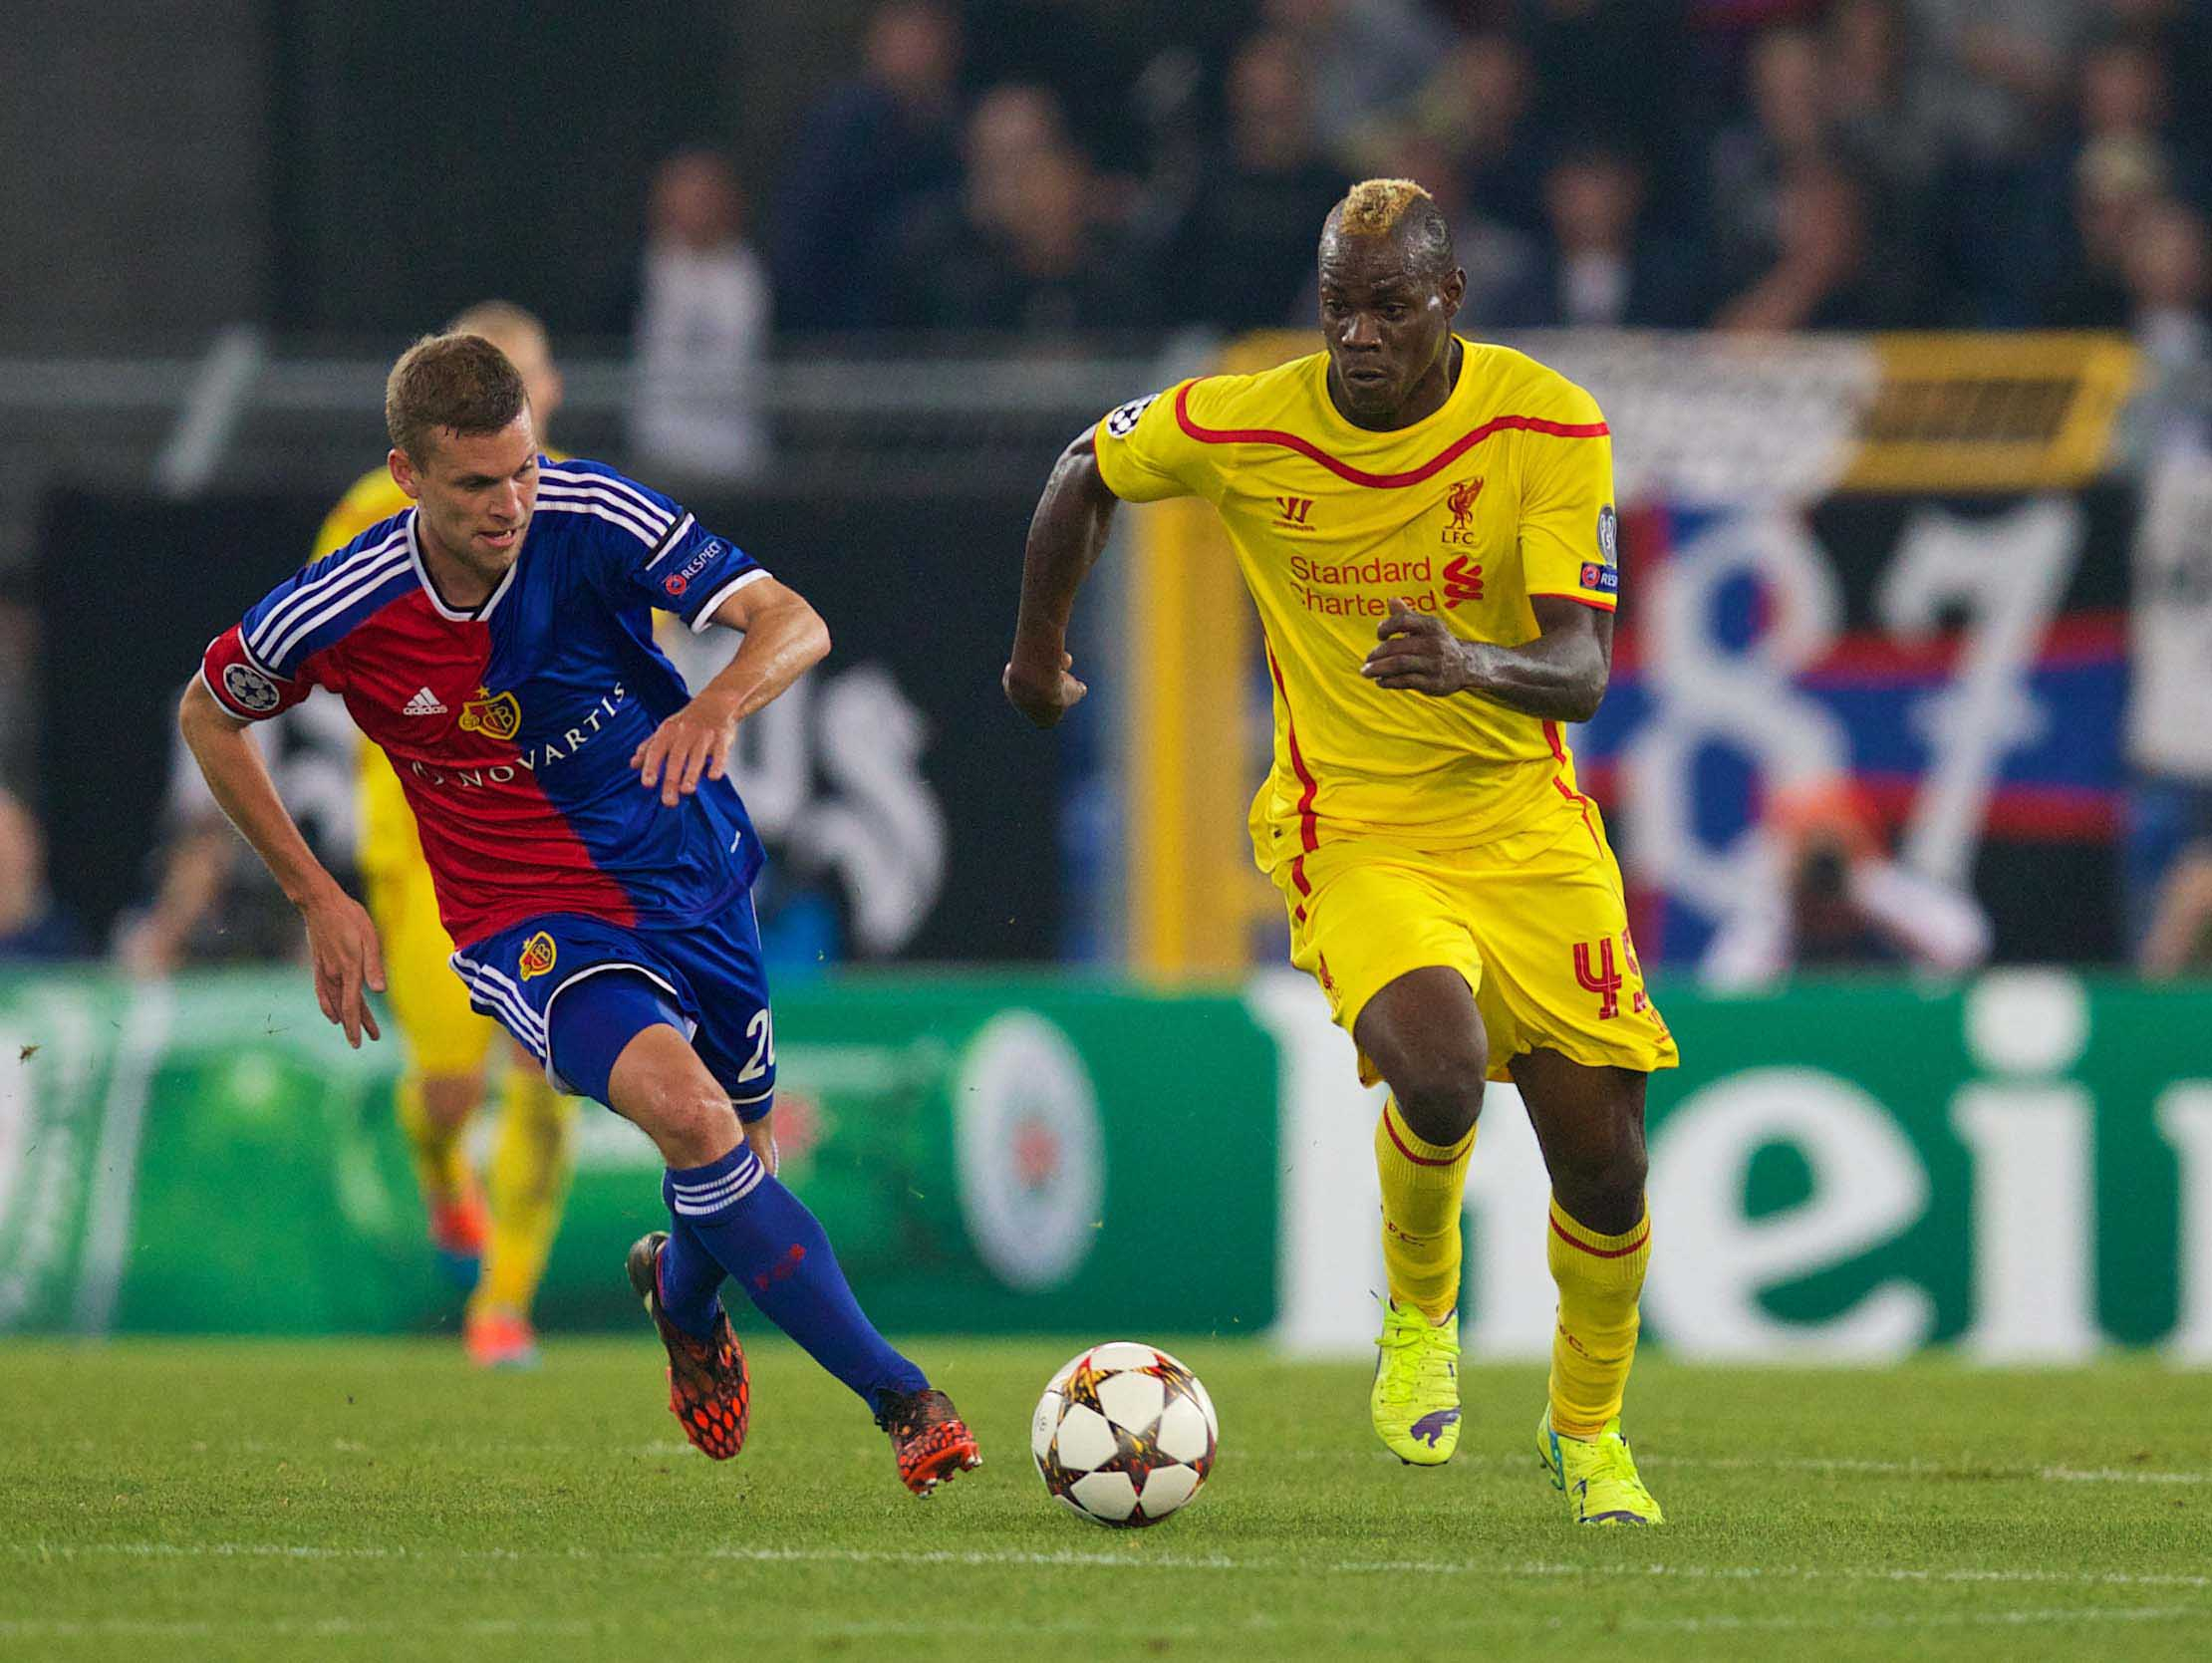 European Football - UEFA Champions League - Group B - FC Basel 1893 v Liverpool FC